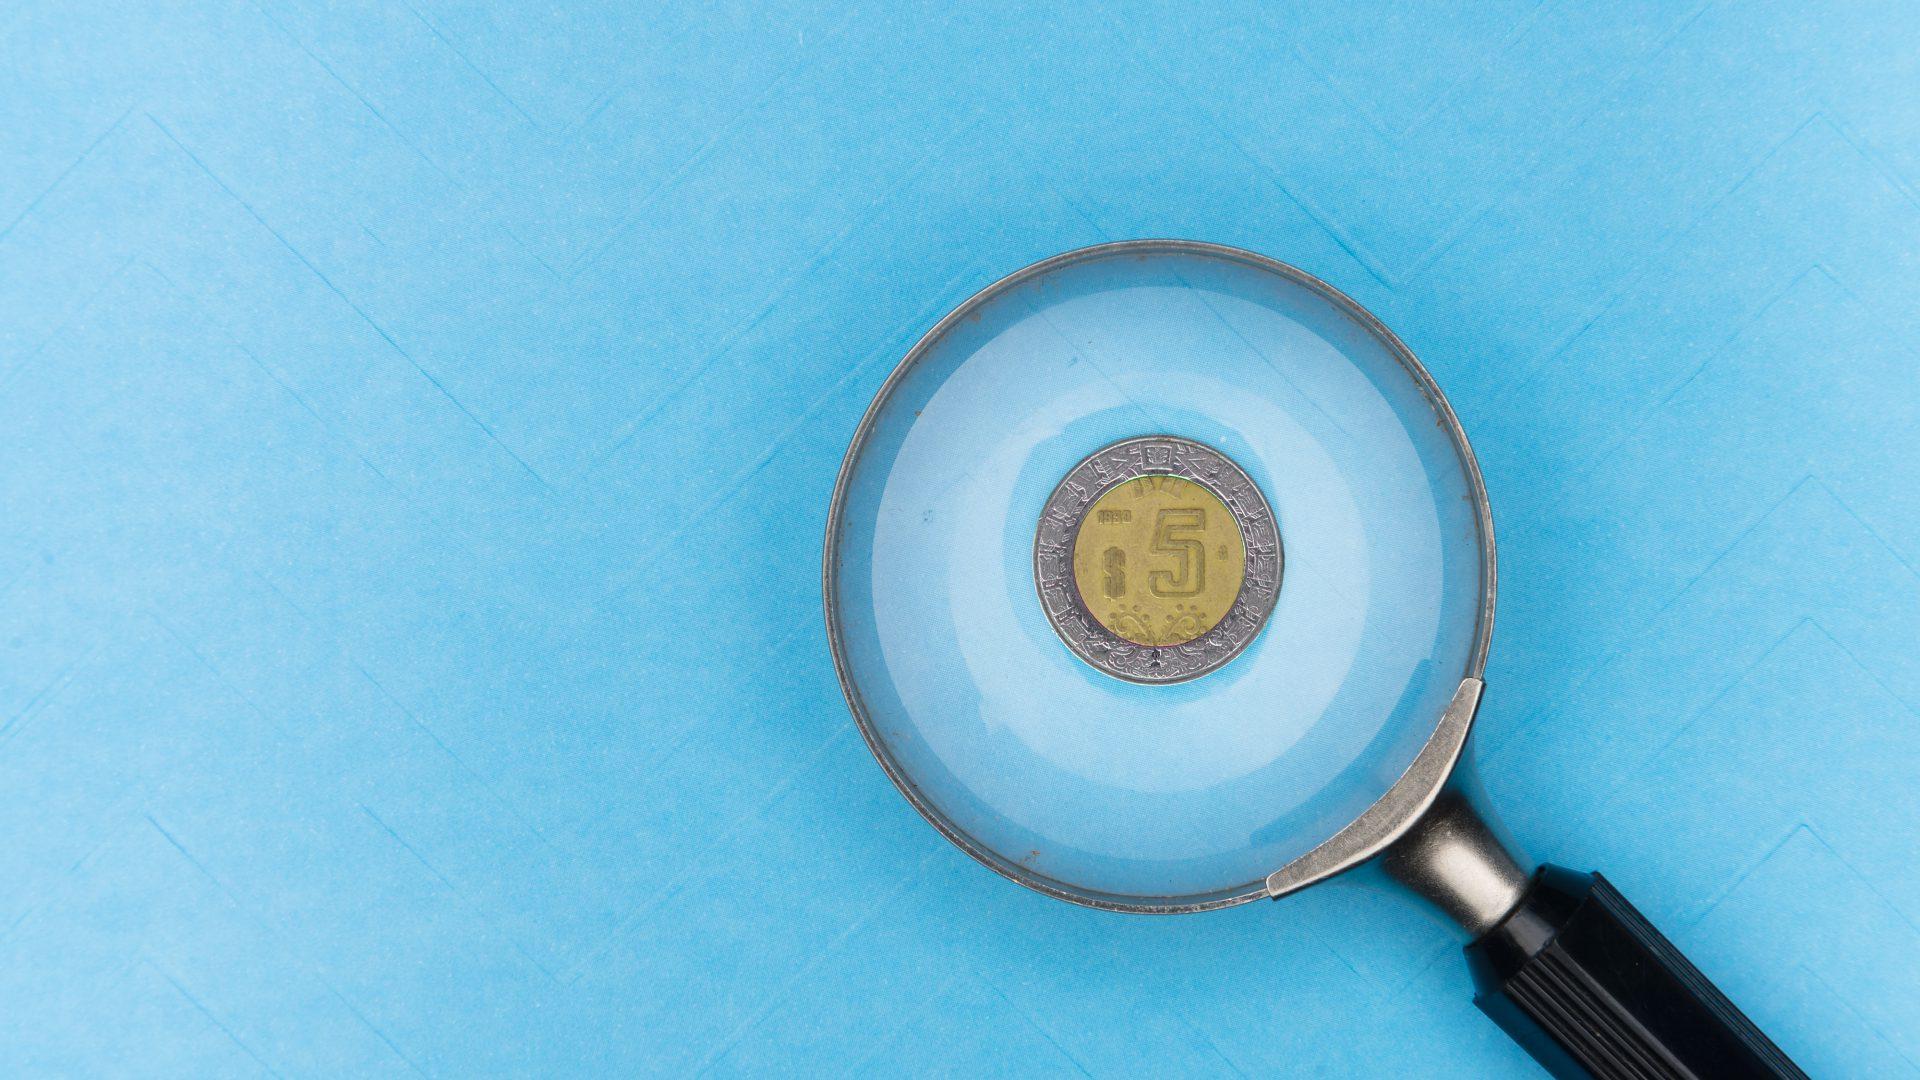 Detecta créditos confiables